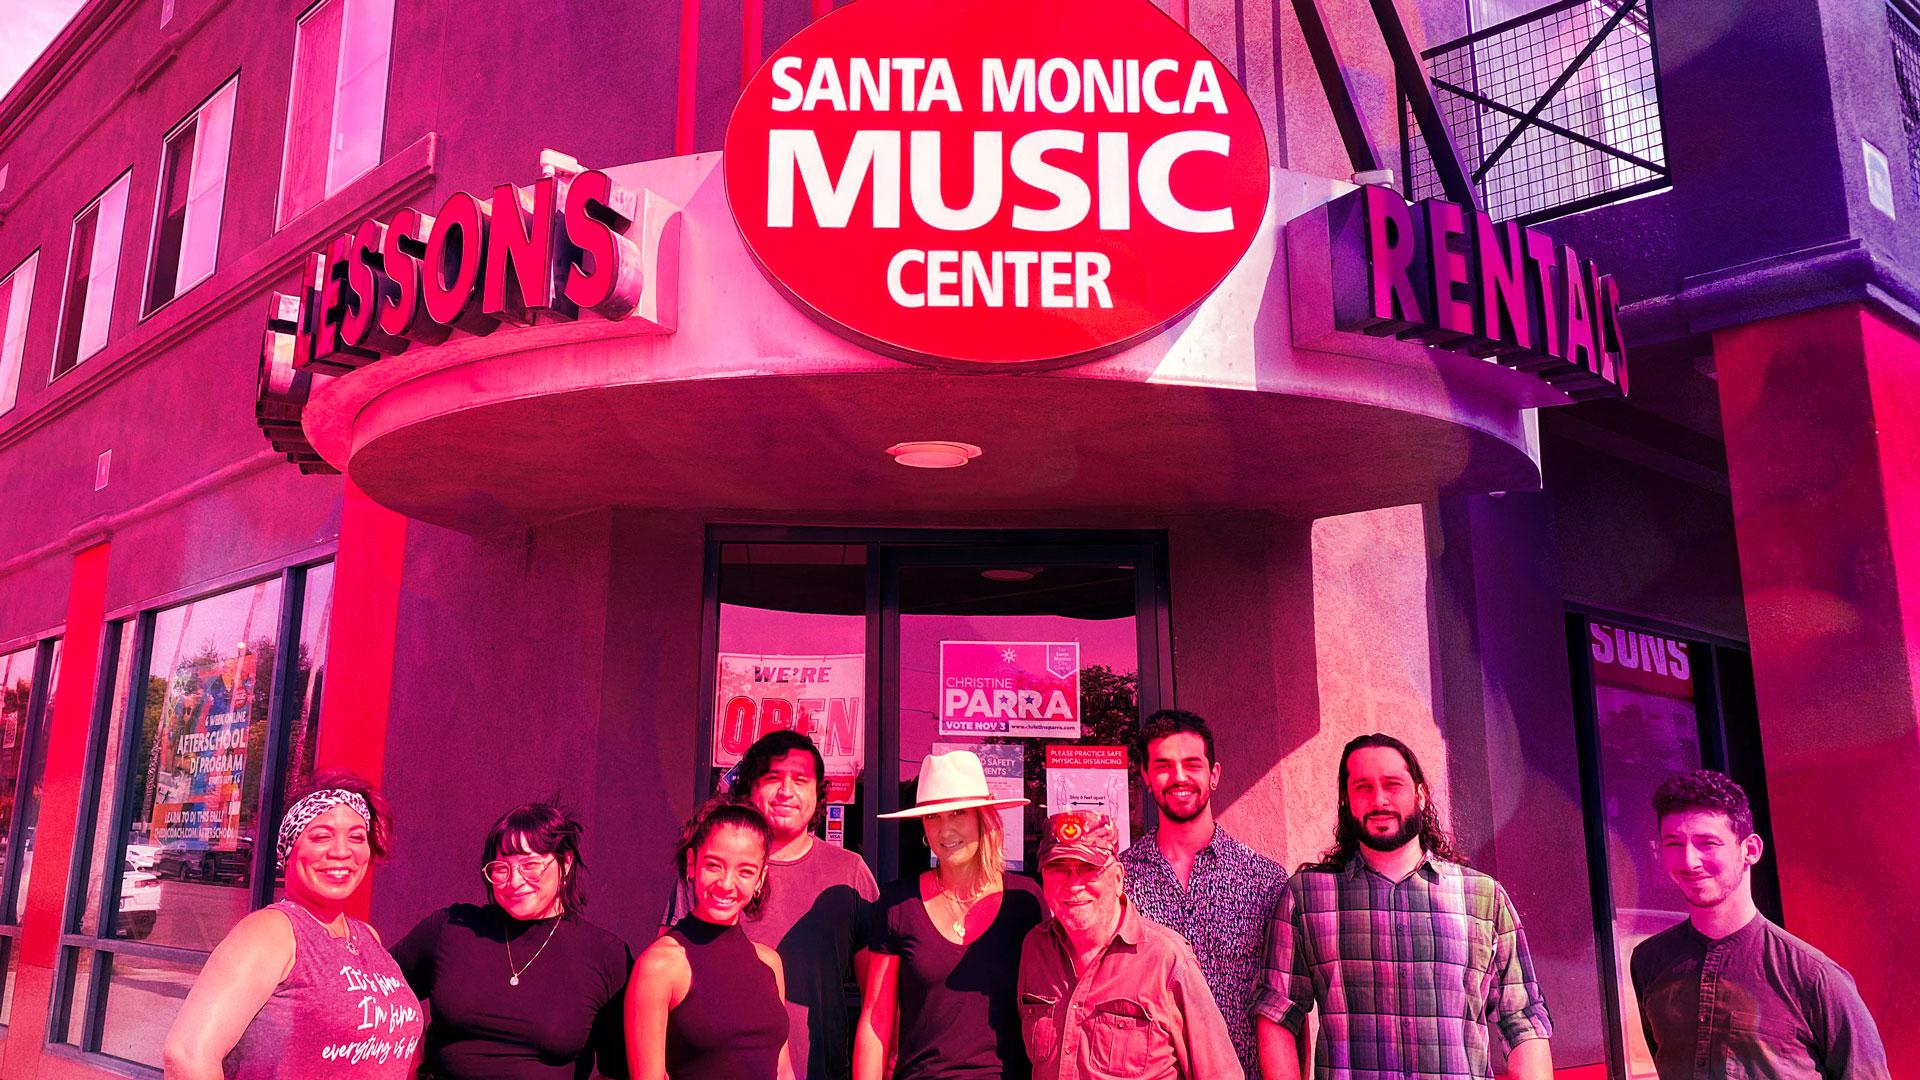 santa monica music center culver city creative center instrument music audio studio video rental rent local